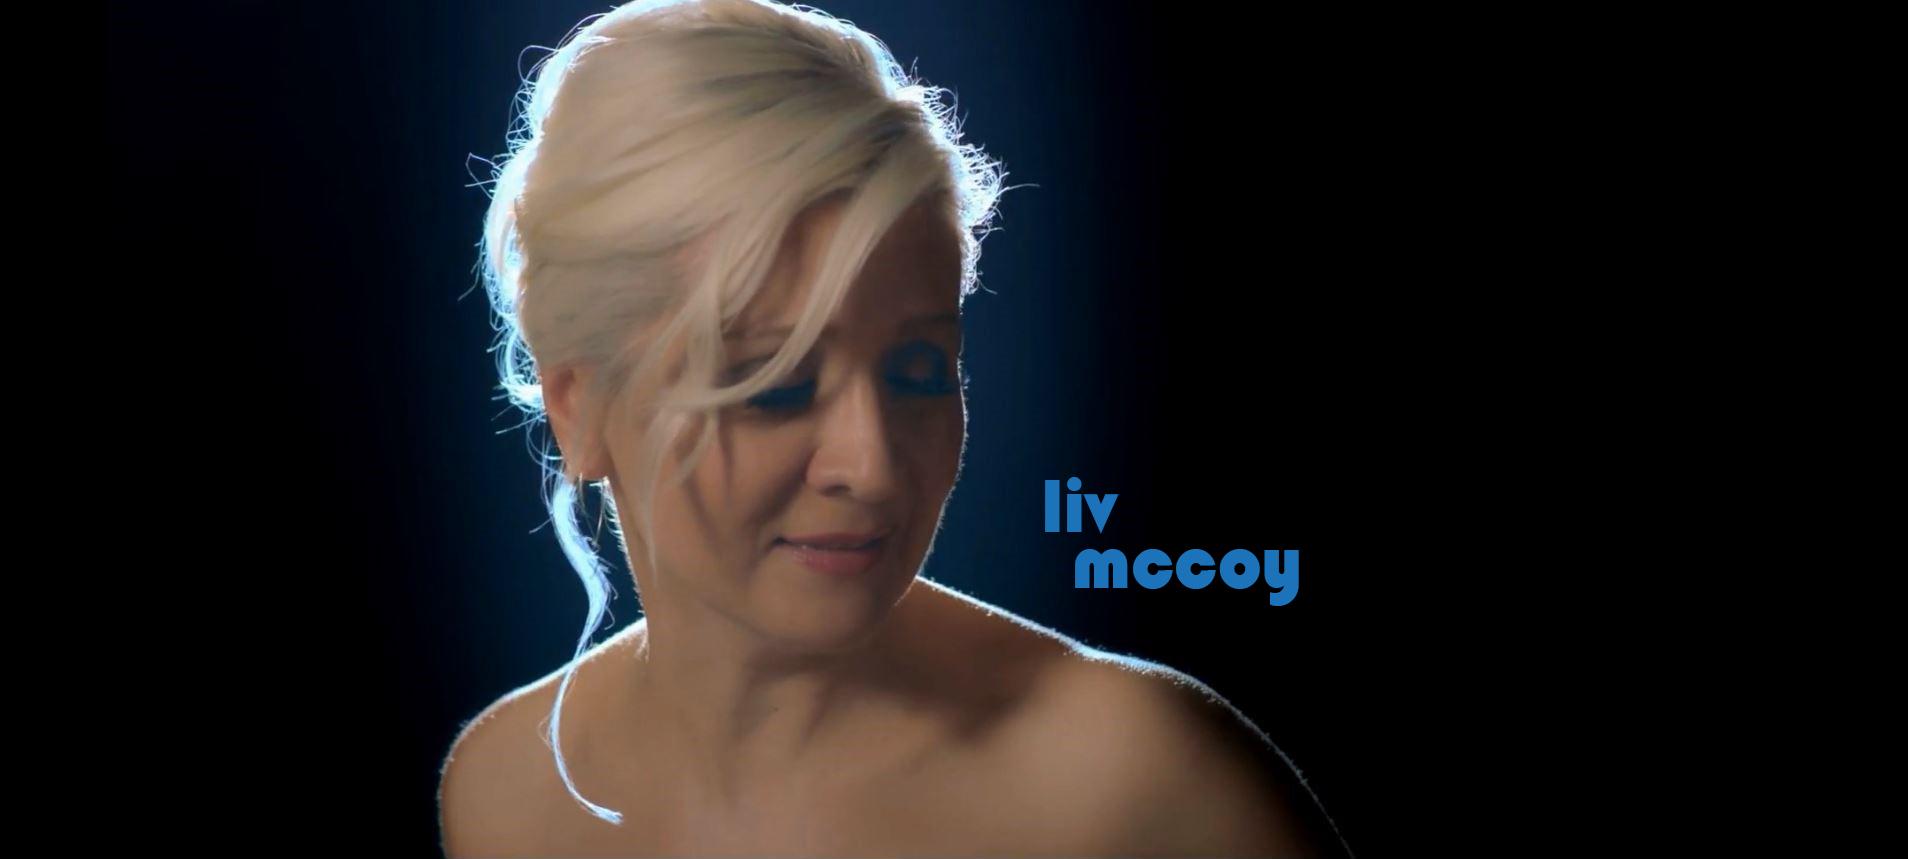 livmccoy